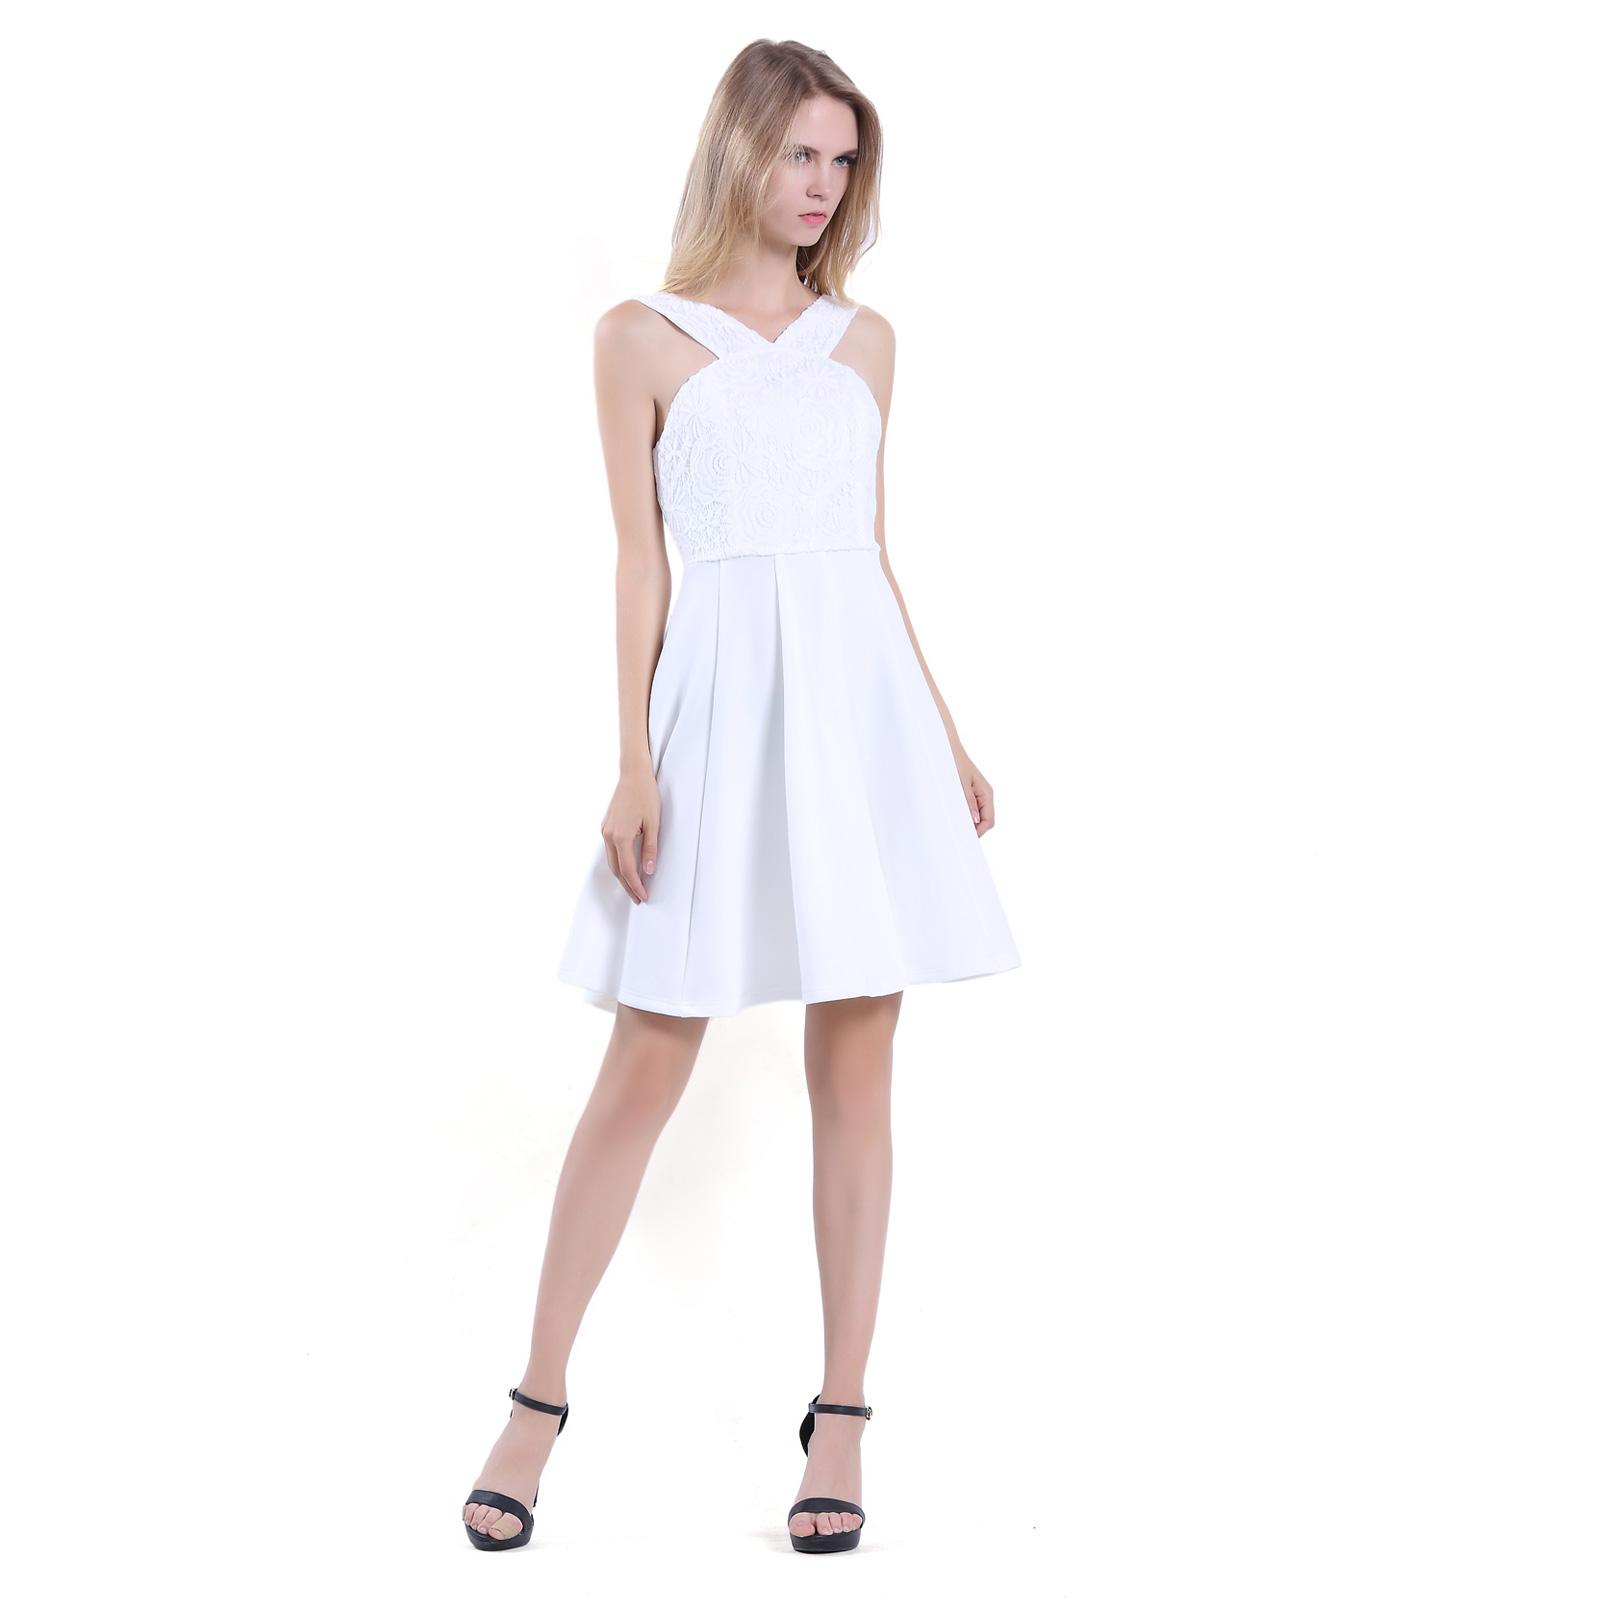 32d138713d03 Women Sleeveless Knee Length A line Halter Strap White Party Cocktail Dress